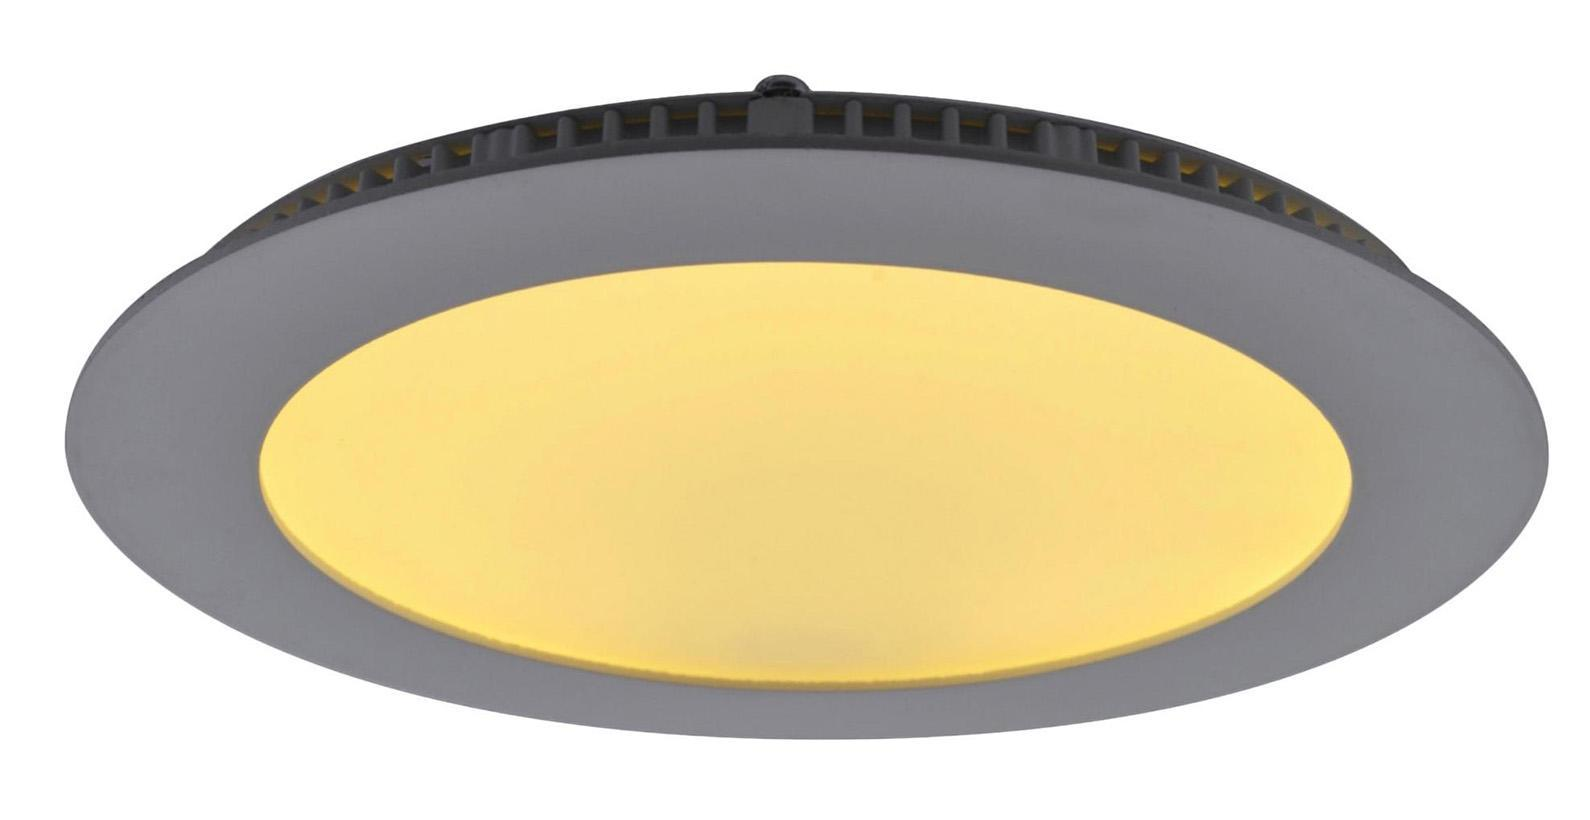 A2612PL-1WH FINE Встраиваемый светильникA2612PL-1WH12W LED; 960 lm Материал: Арматура: Алюминий / Элемент декора: ПластикРазмер: 174x174x25Цвет: Белый